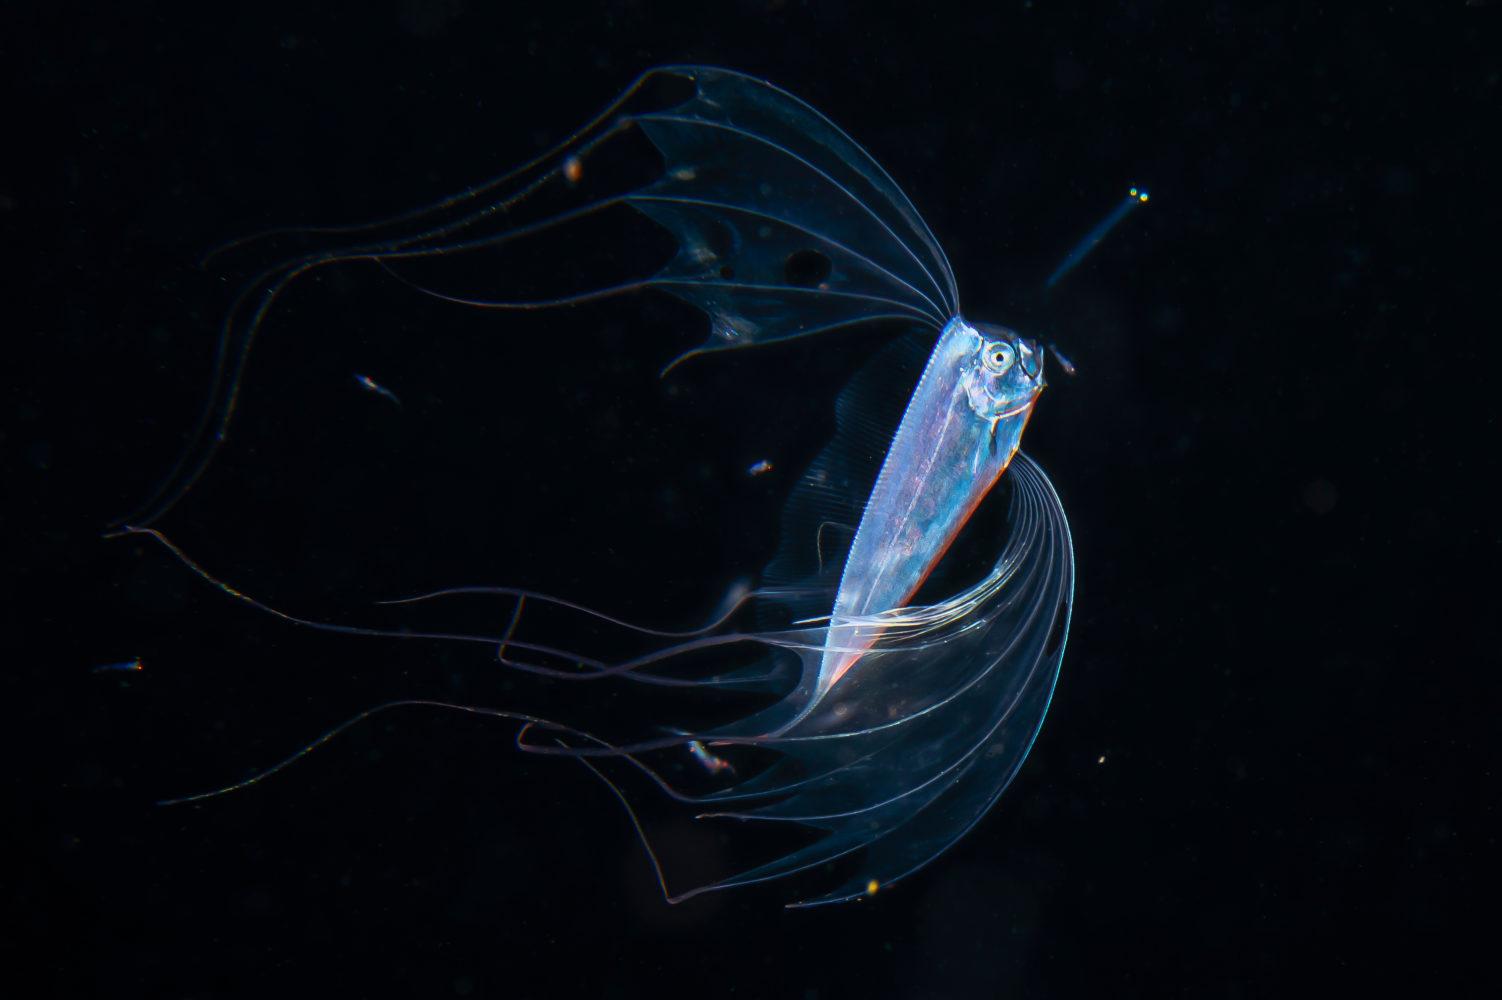 En båndfisk med metallisk kropp og lange, bølgende finner